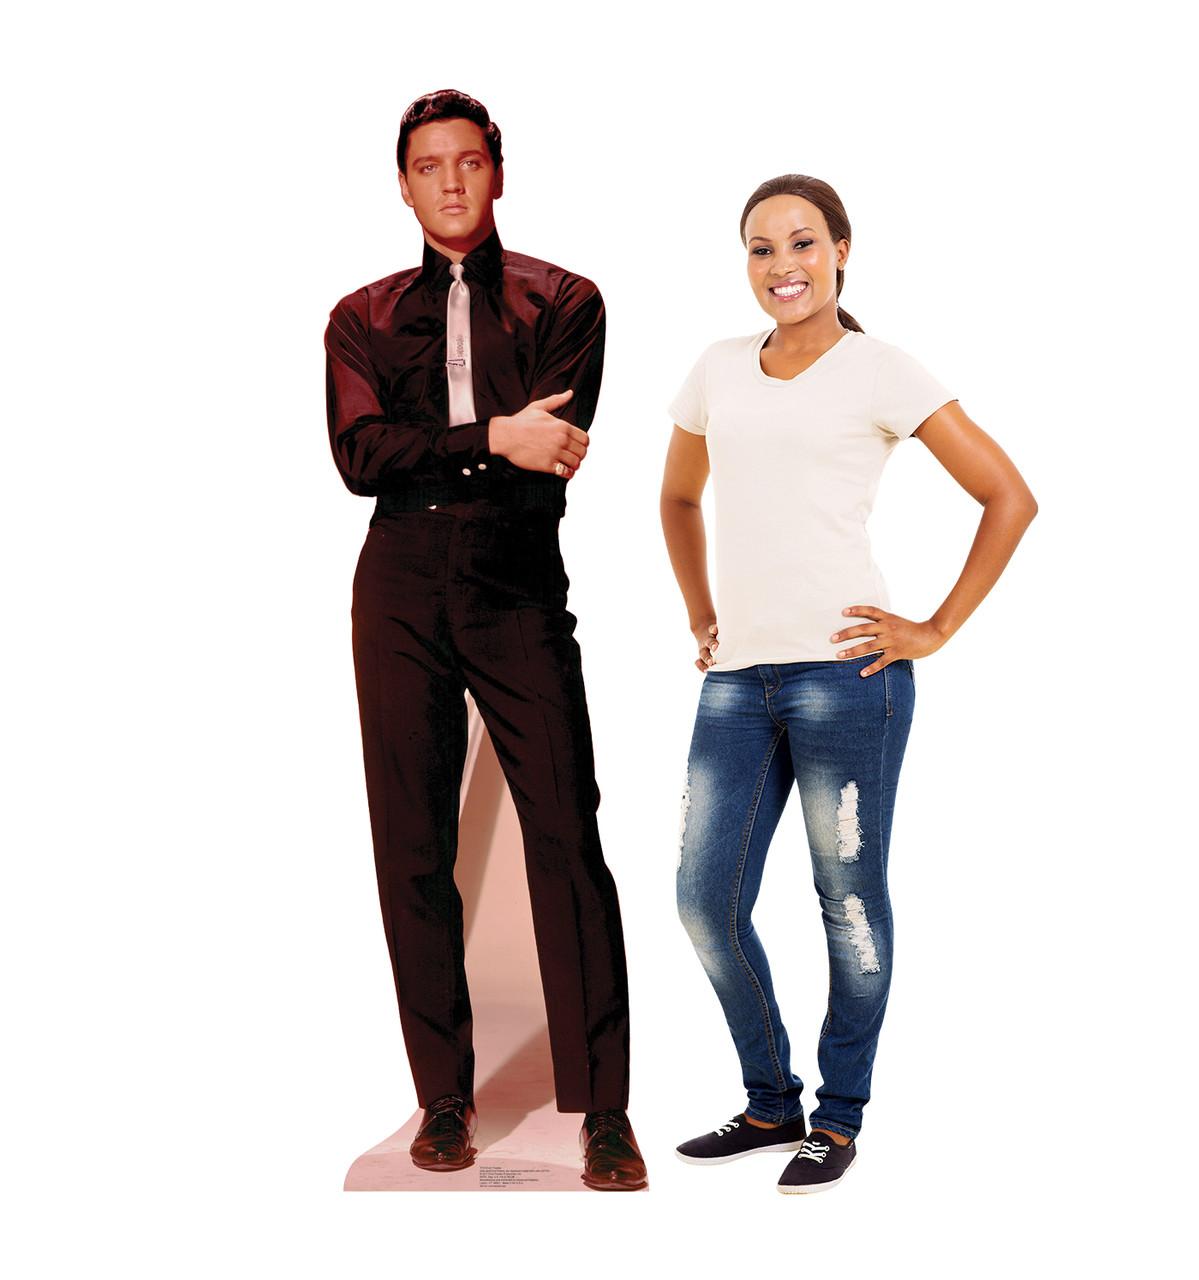 Life-size Elvis Presley Talking 1 Cardboard Standup with model